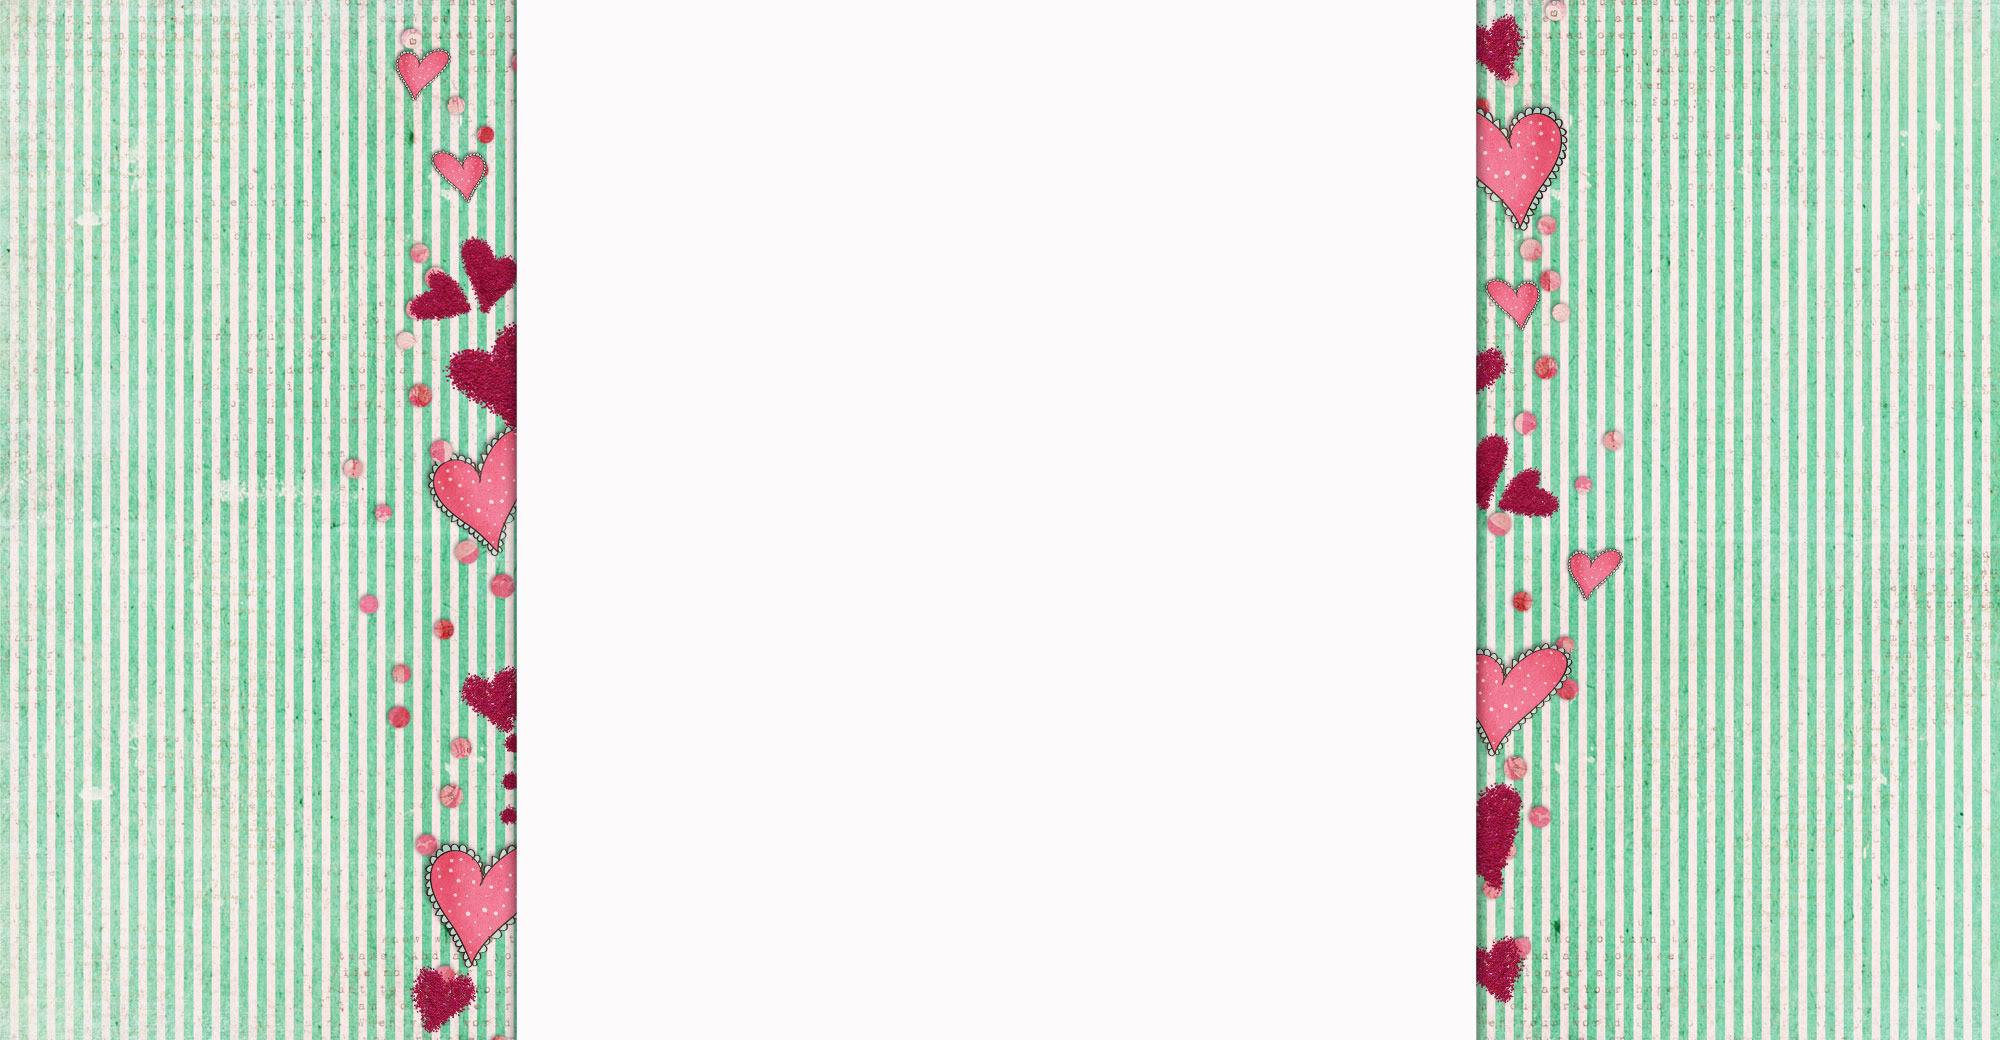 Valentines Blog Backgrounds DesignerBlogscom 2000x1040